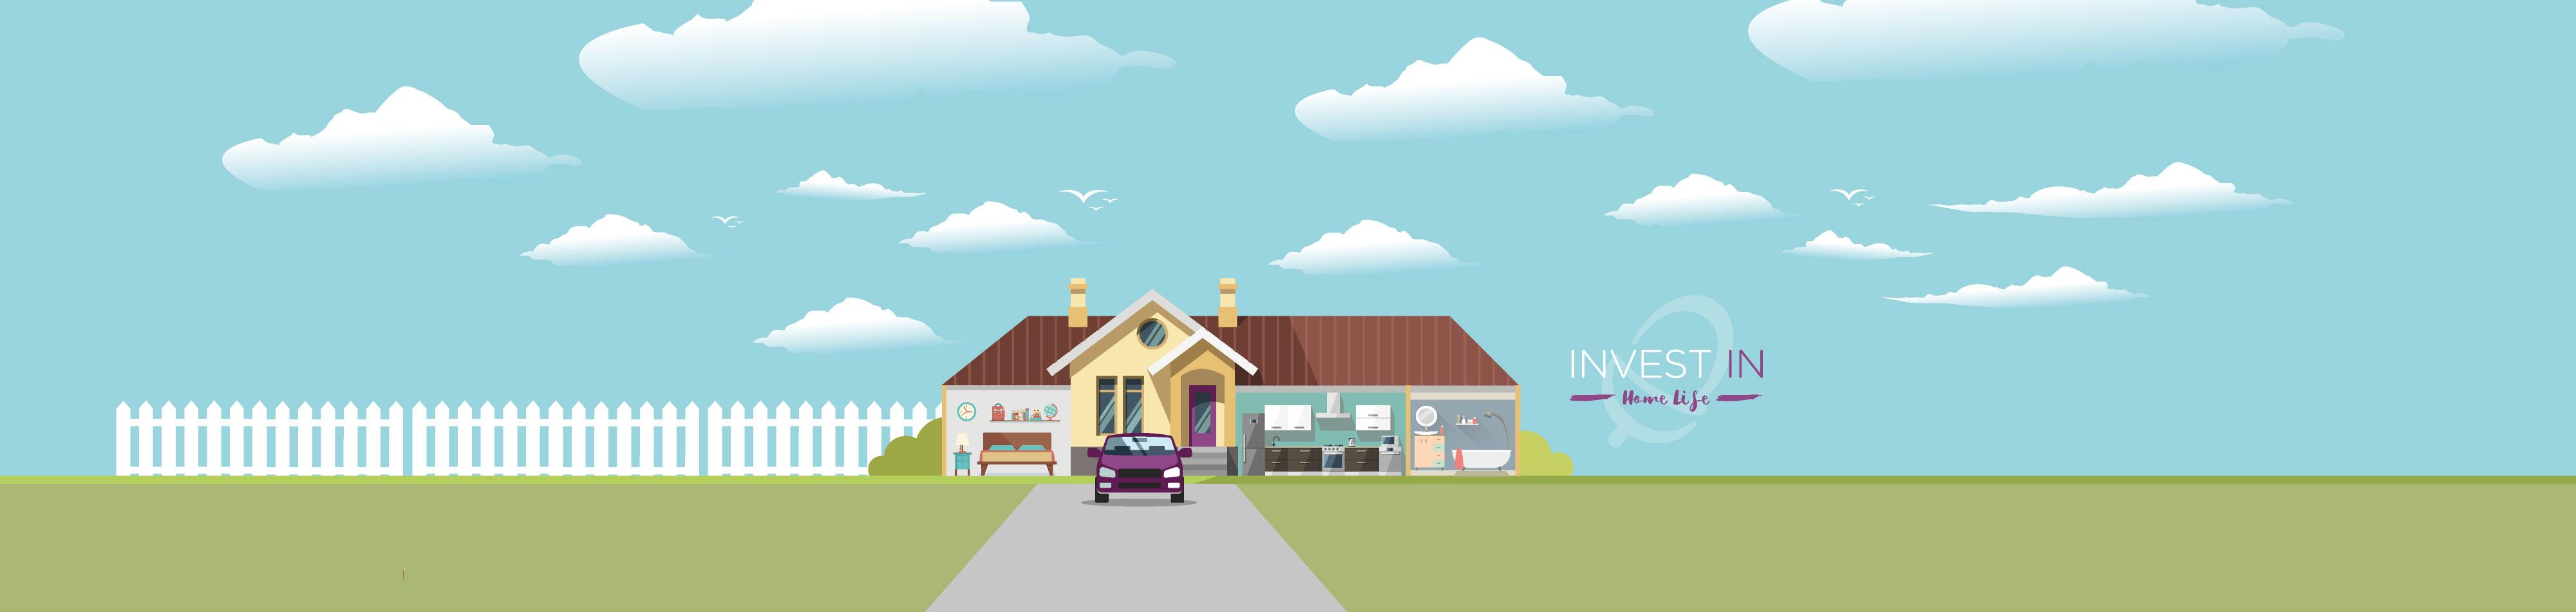 investin-home-life-campaign-home